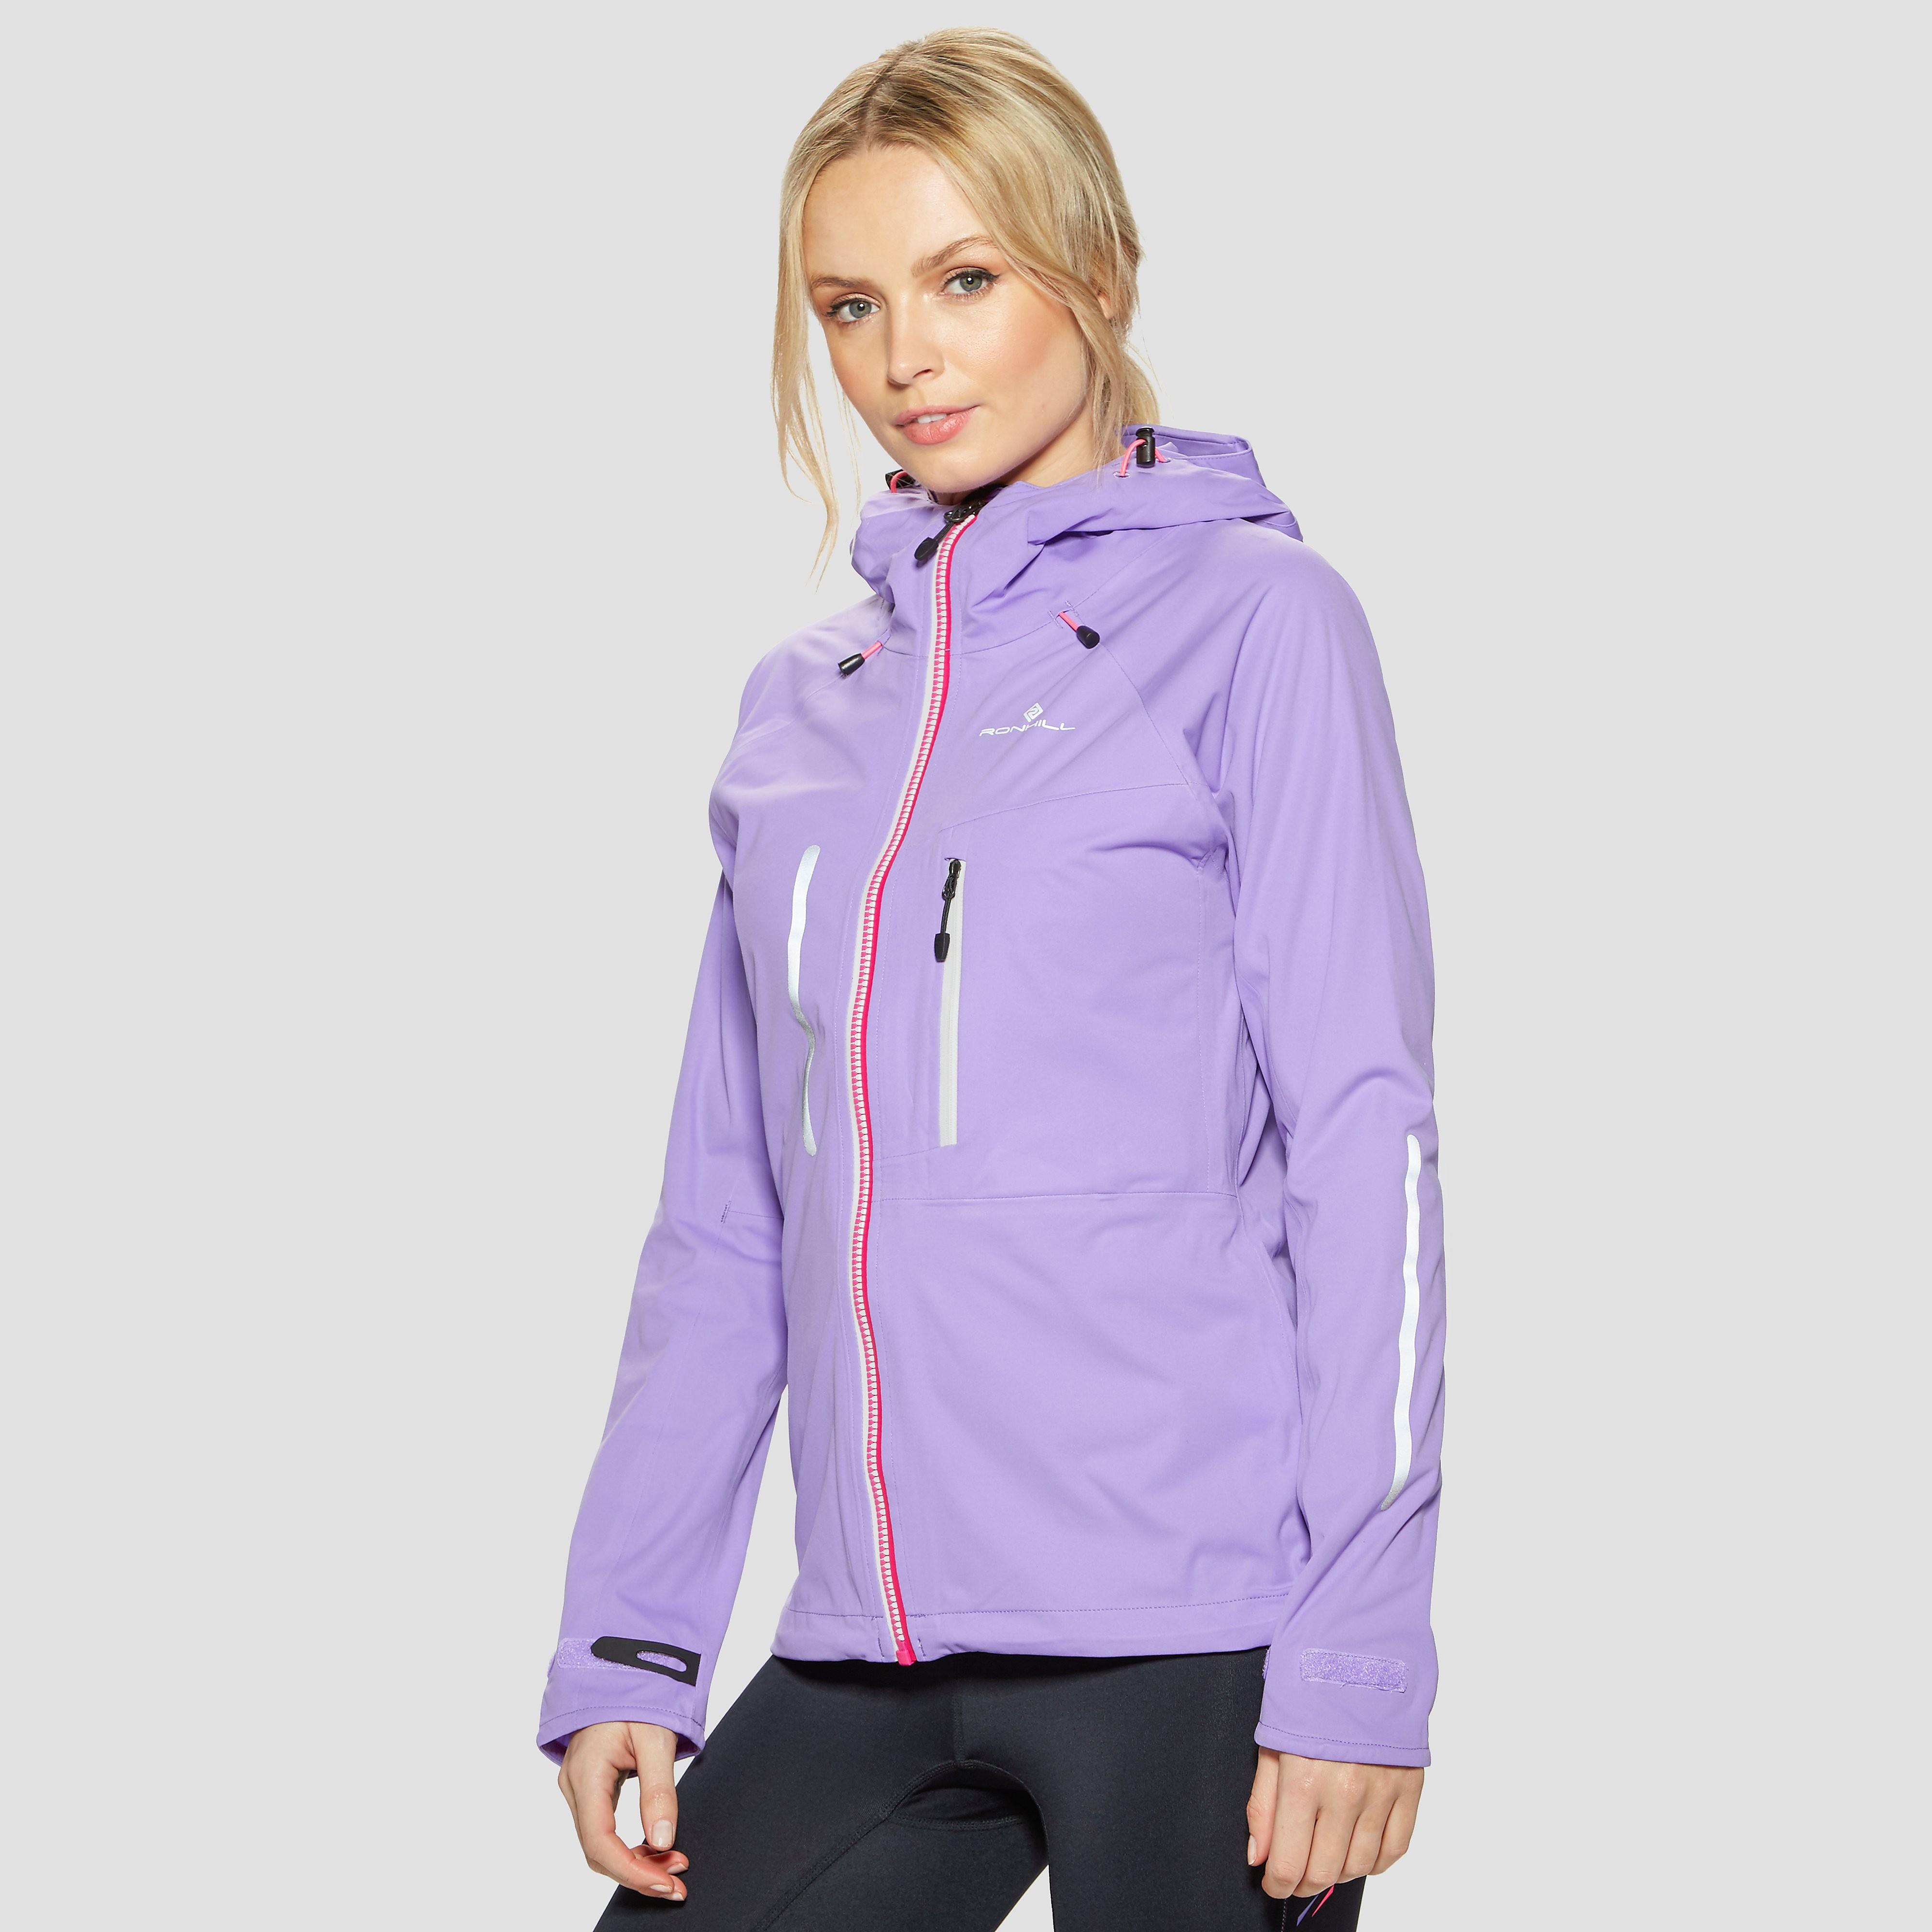 Ronhill Vizion Storm Women's Running Jacket